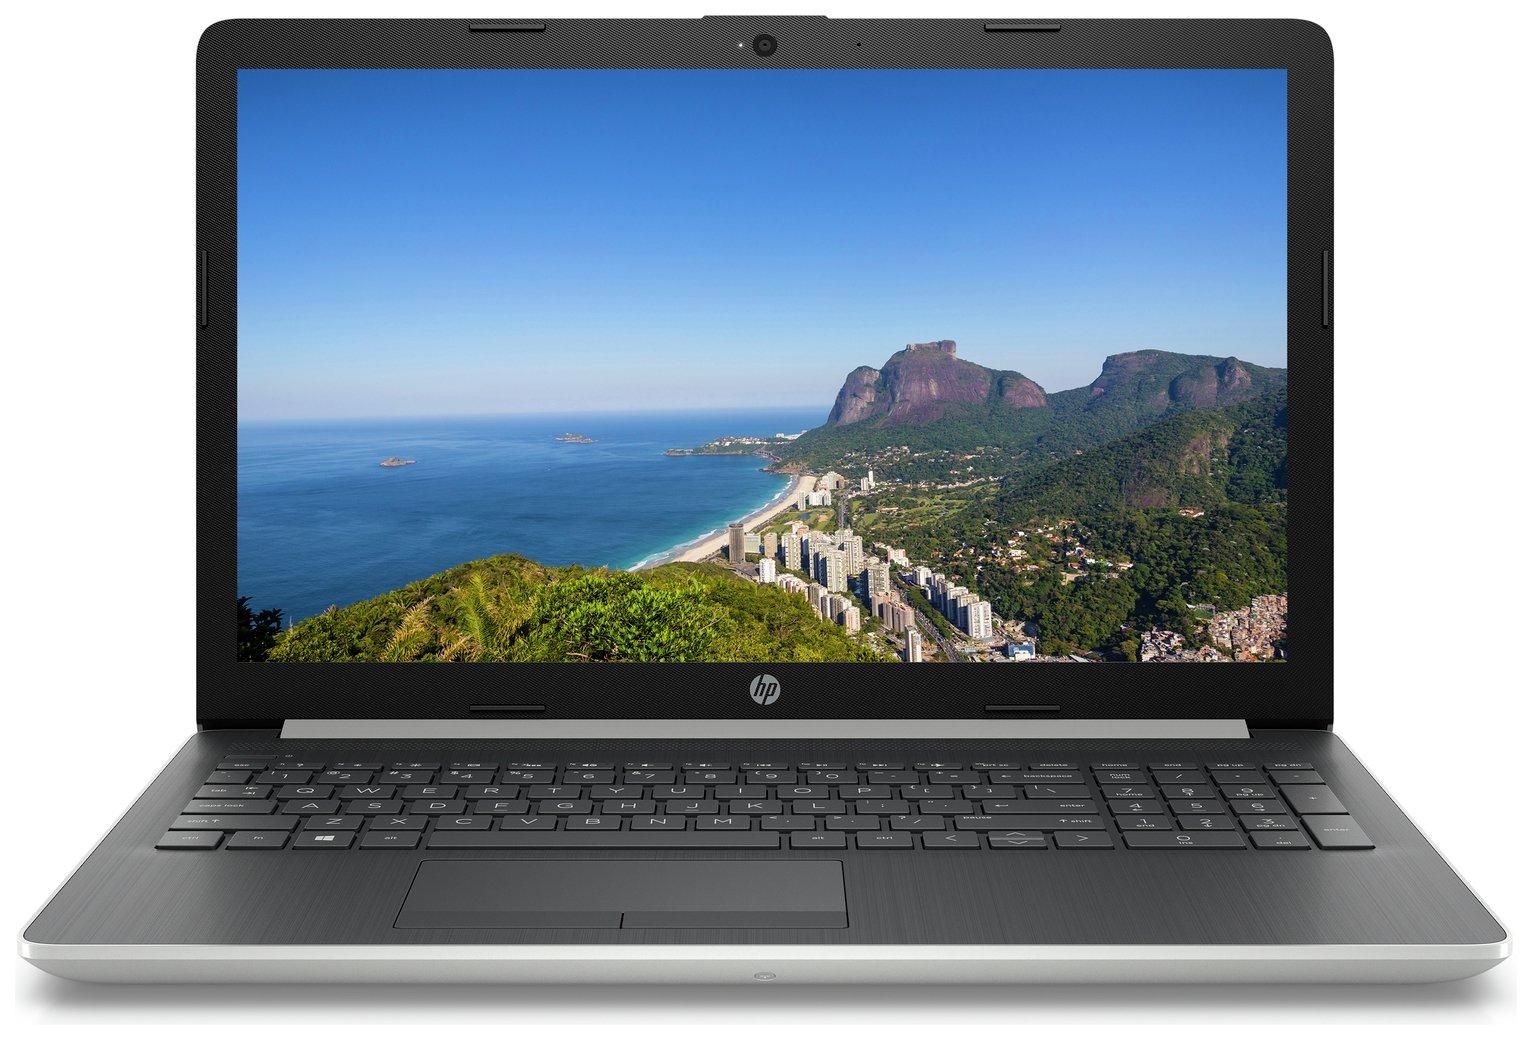 HP 15.6 Inch i5 4GB + 16GB Optane 1TB Full HD Laptop